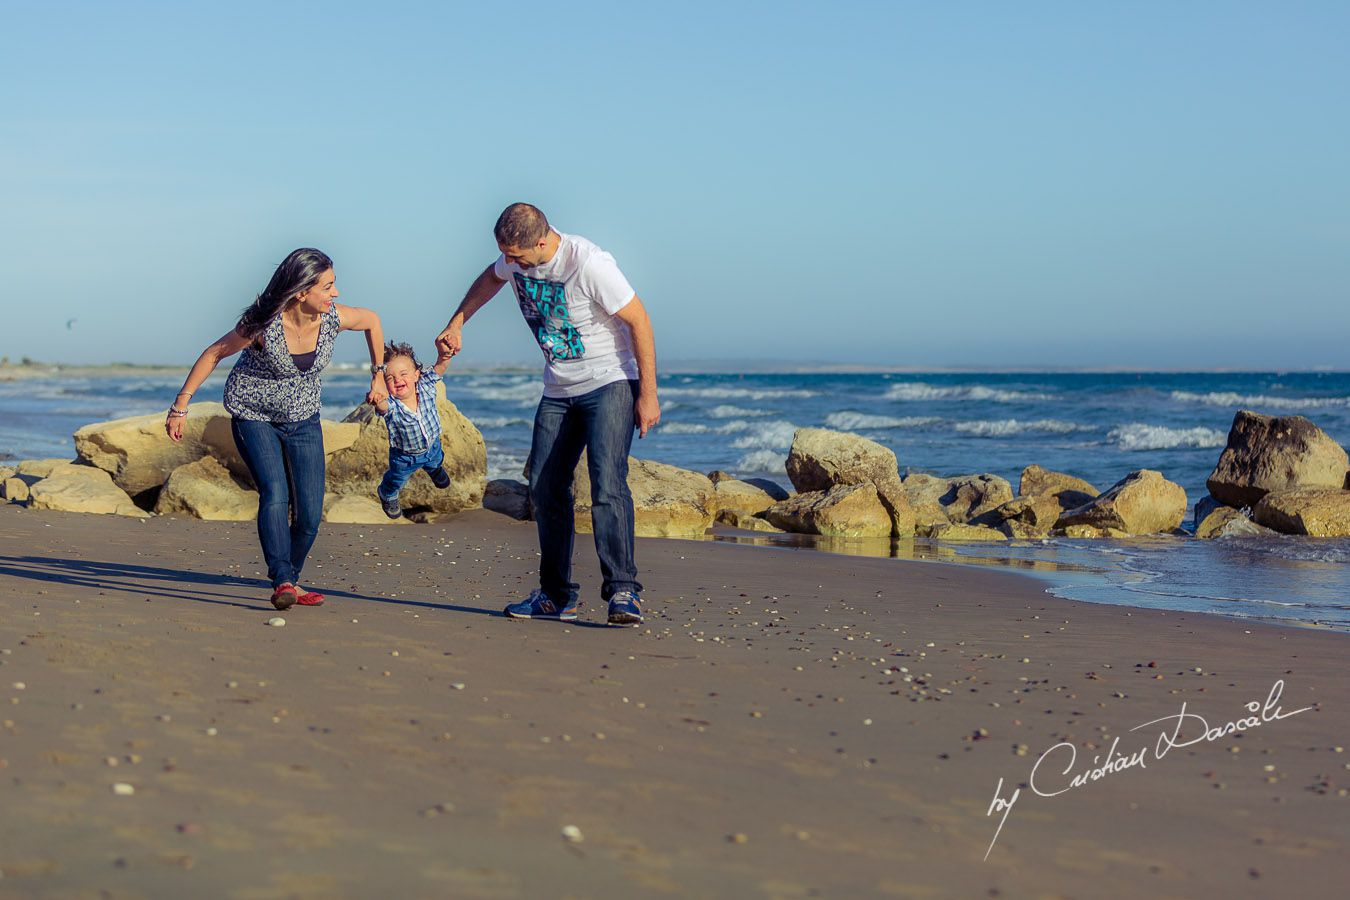 Maria, George & Harry - Having fun at Curium Beach, Cyprus. Photographer: Cristian Dascalu